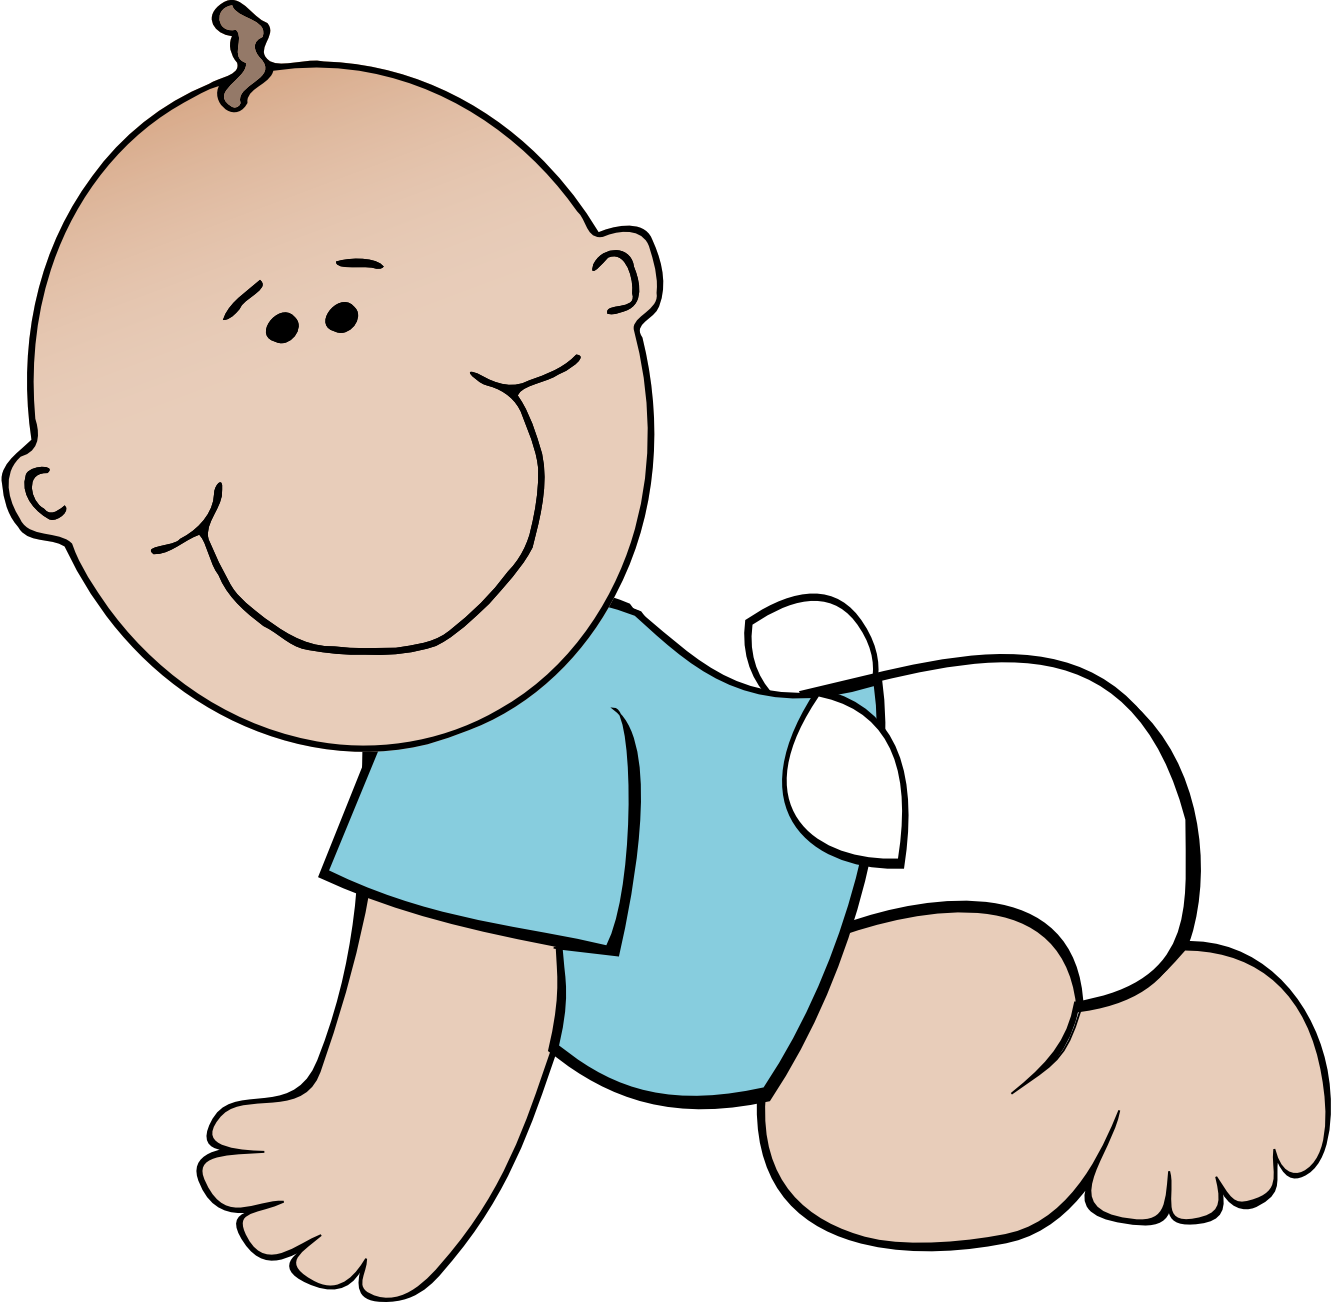 1331x1302 Stork Ba Clipart Free Graphics Of Storks Delivering Babies